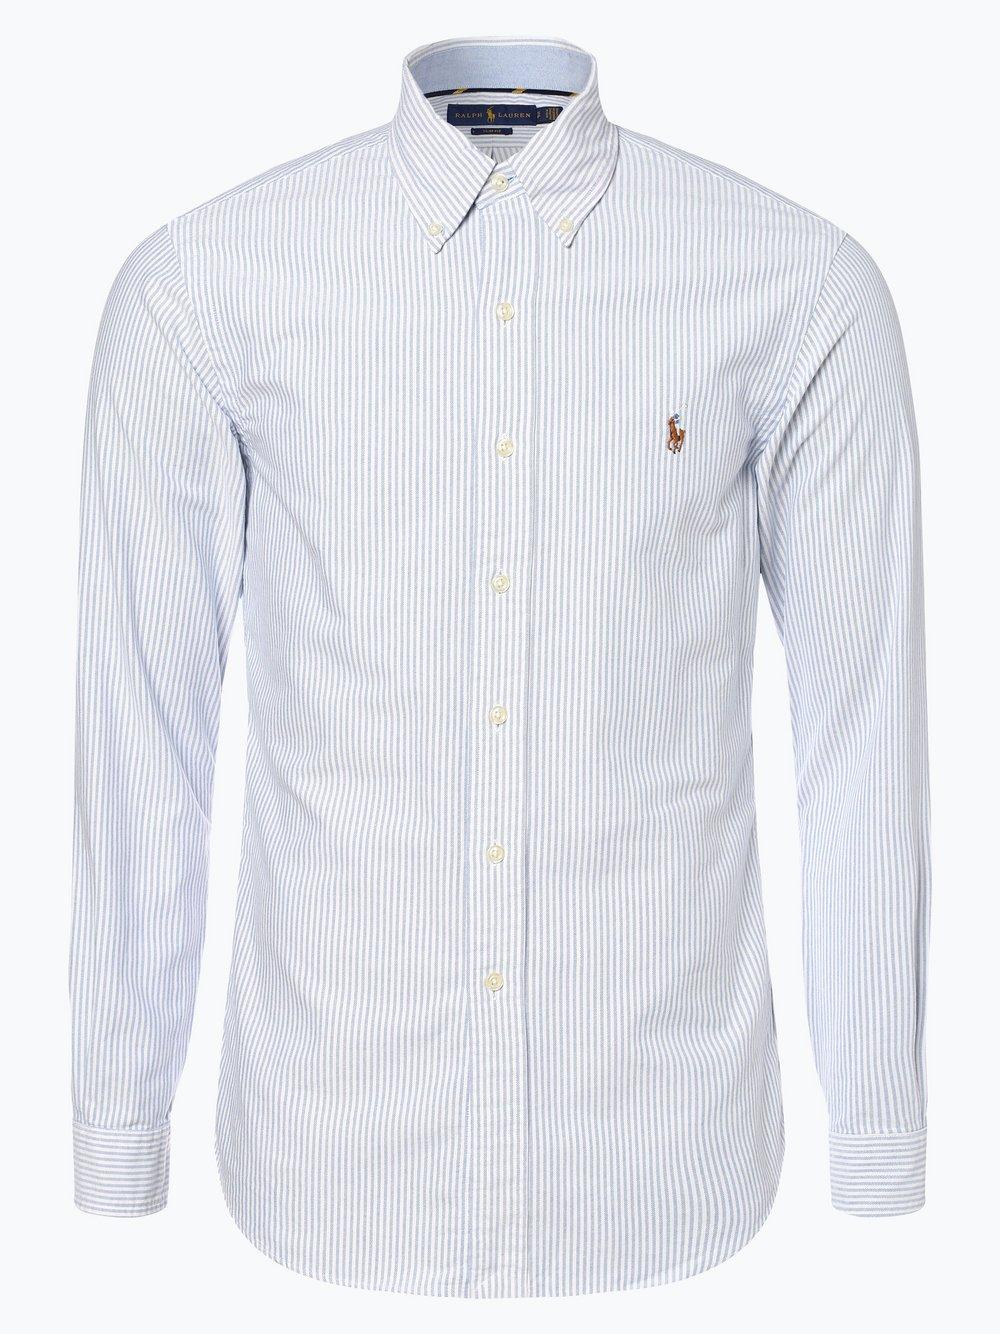 1783a9da4fe7 Polo Ralph Lauren Herren Hemd - Slim Fit  2  online kaufen   PEEK ...